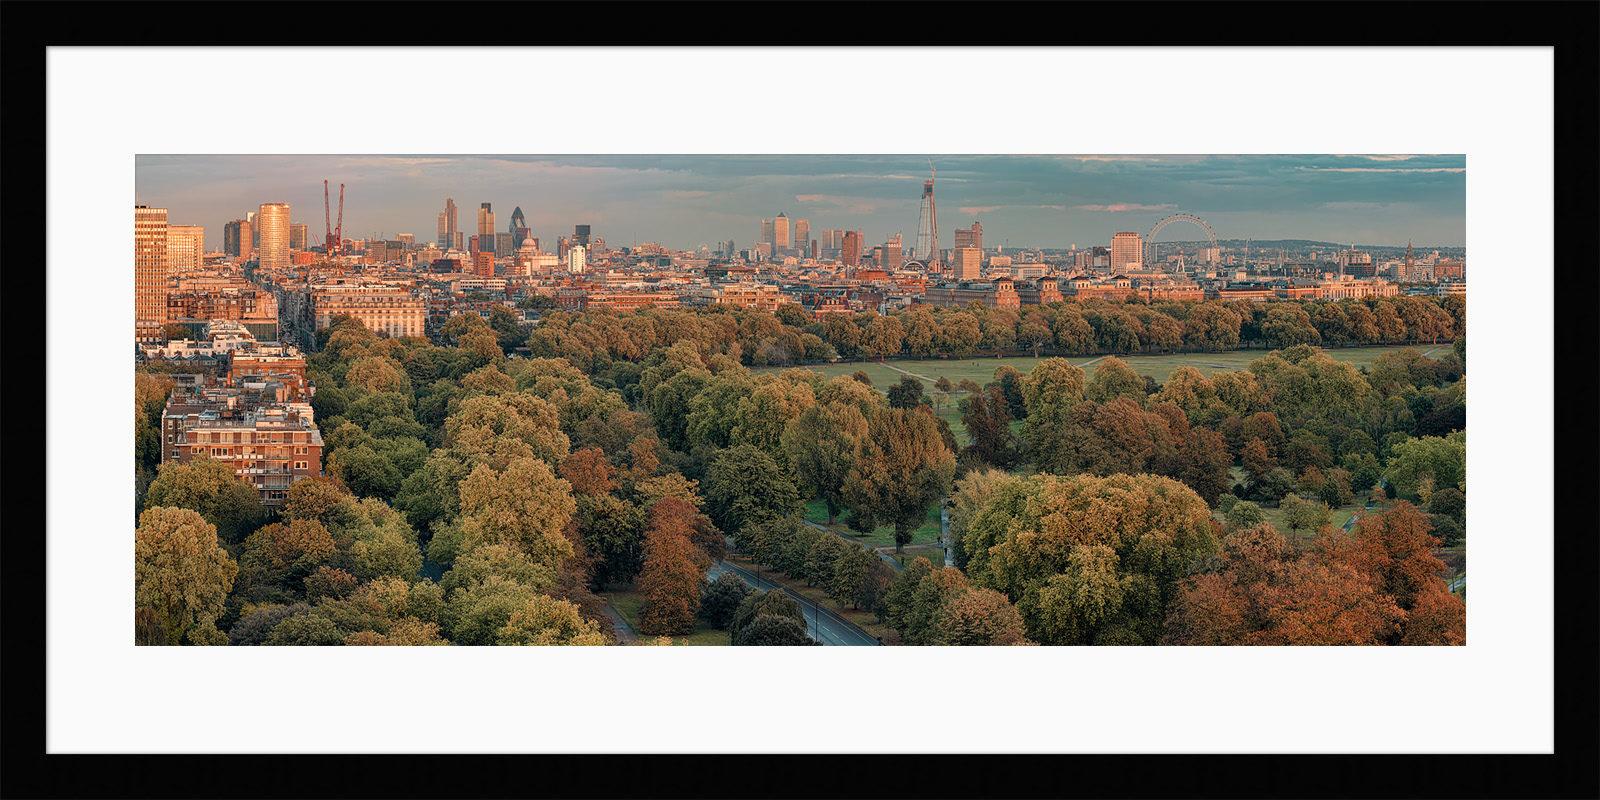 Hyde Park 2011 - Framed Photo Prints of London